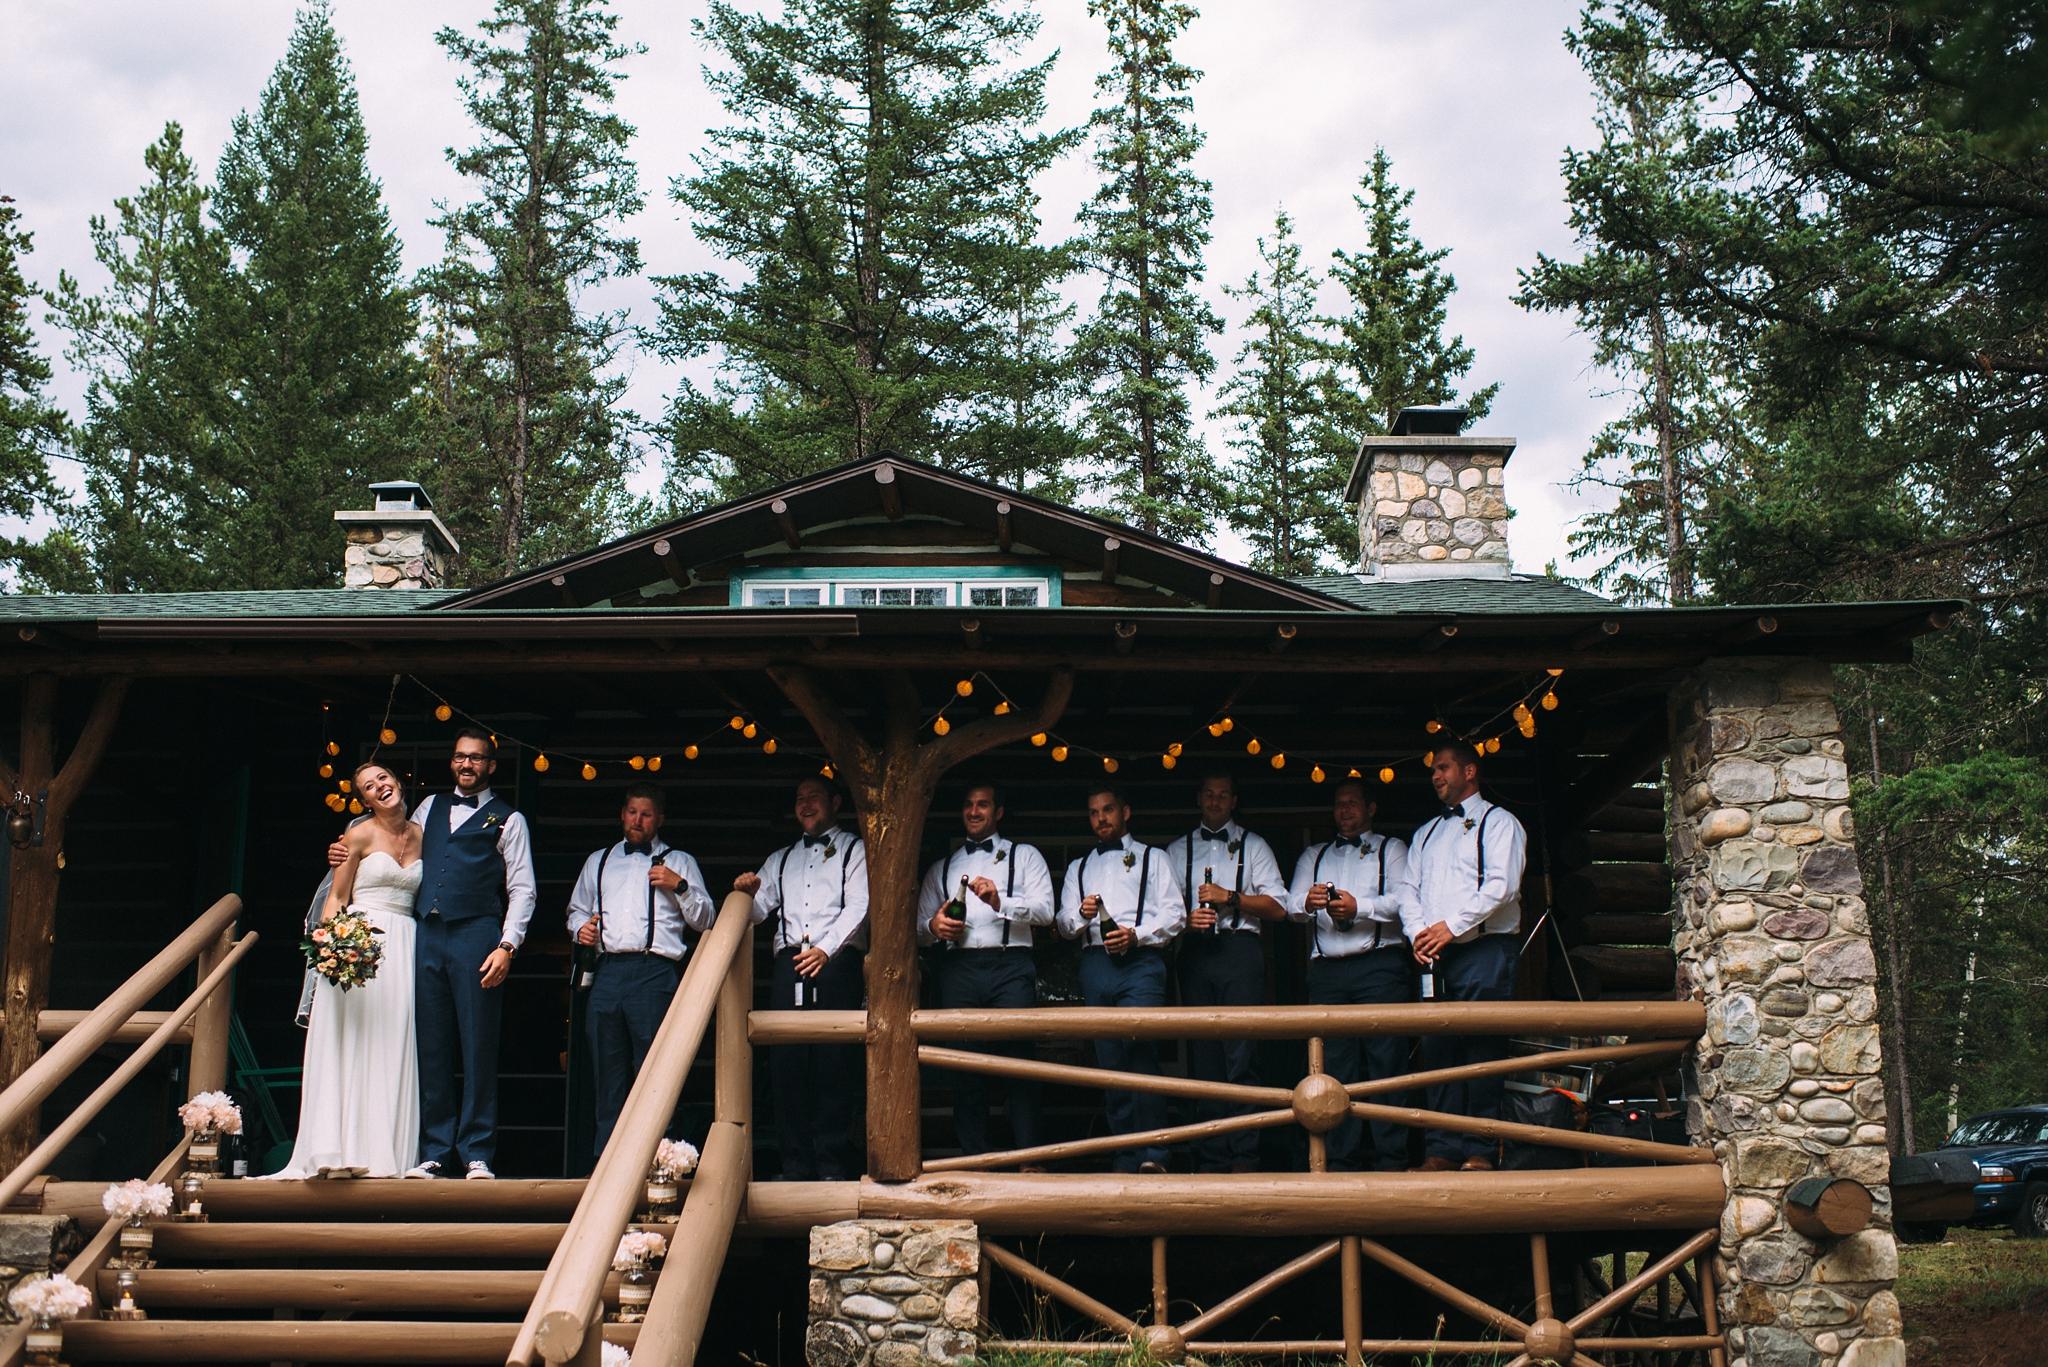 kaihla_tonai_intimate_wedding_elopement_photographer_2535